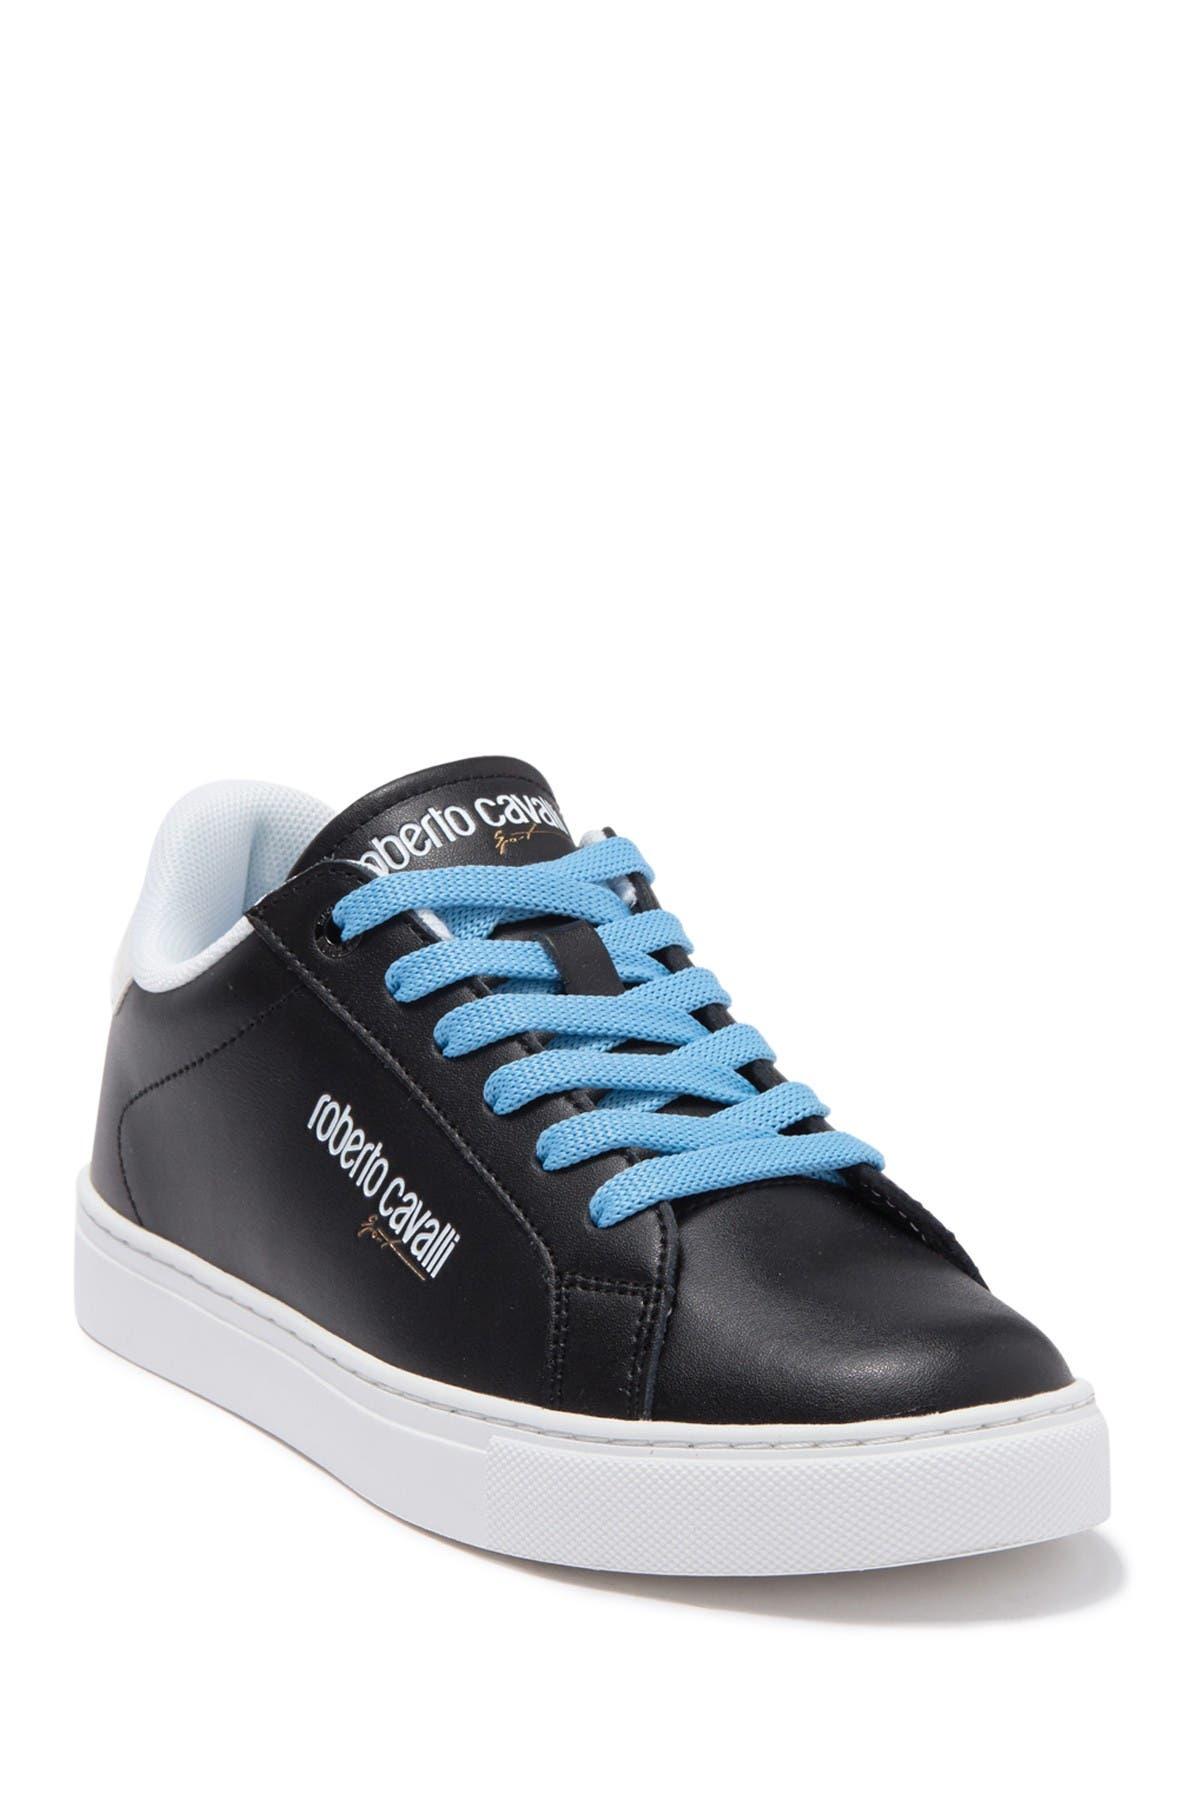 Image of Roberto Cavalli Brand Detailed Sneaker